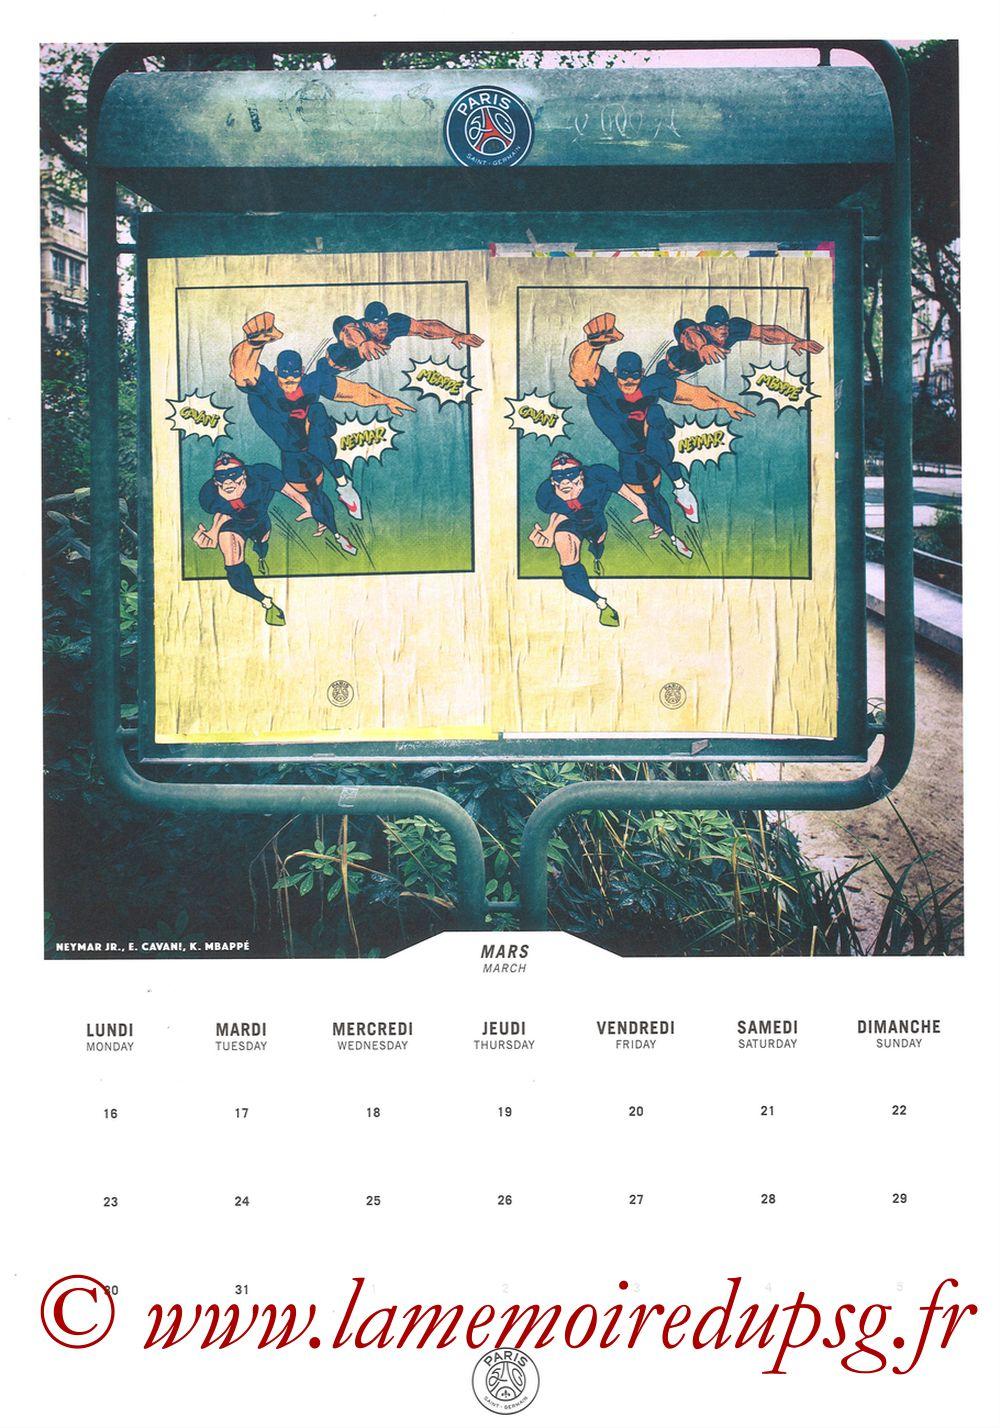 Calendrier PSG 2020 - Page 06 - NEYMAR JR+ CAVANI + MBAPPE